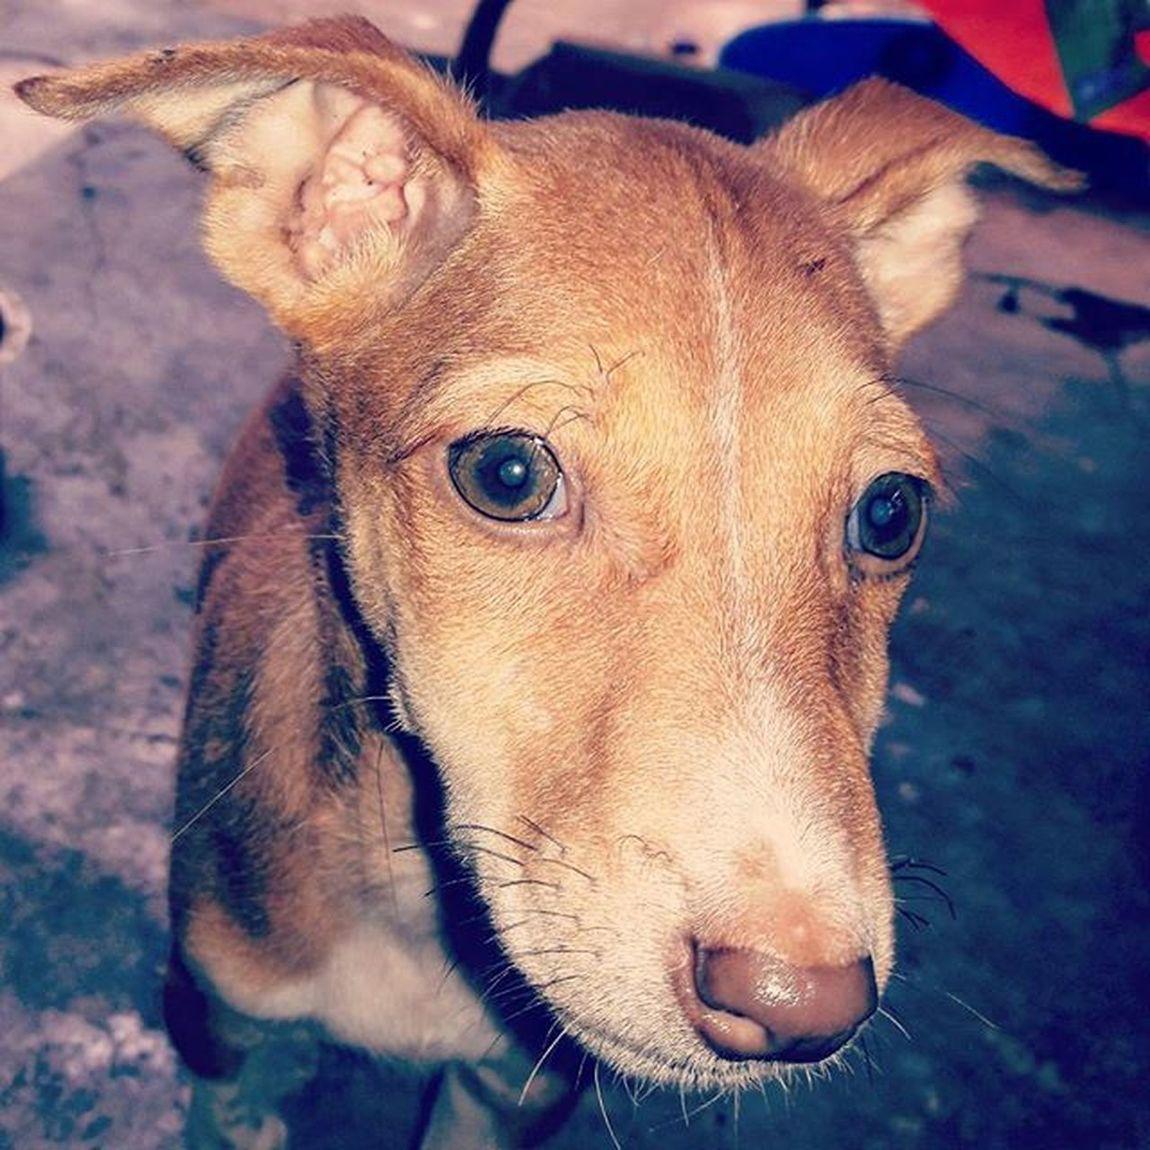 Asli 😍😍😍 Petlove  Doggie Sweety  Dogs Pets Babydog DogLove Bluecross Peta Indian Countrydog